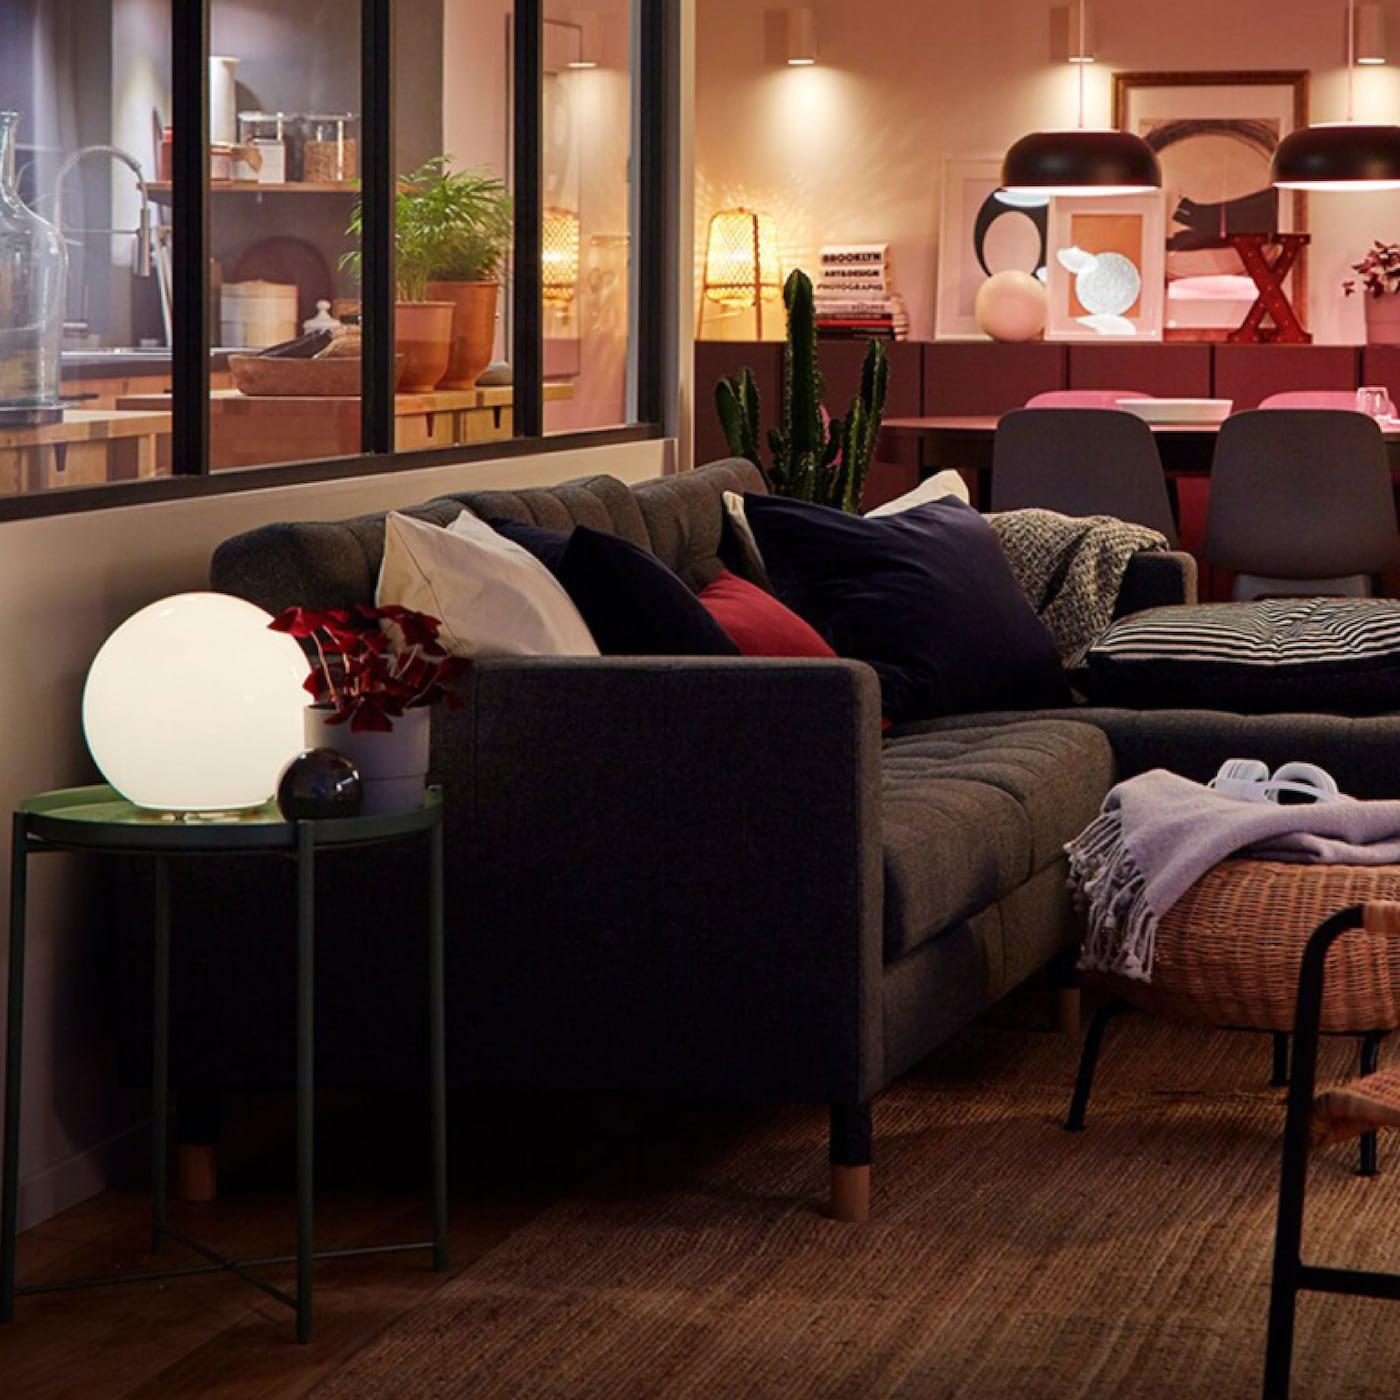 Sistema IKEA Home smart